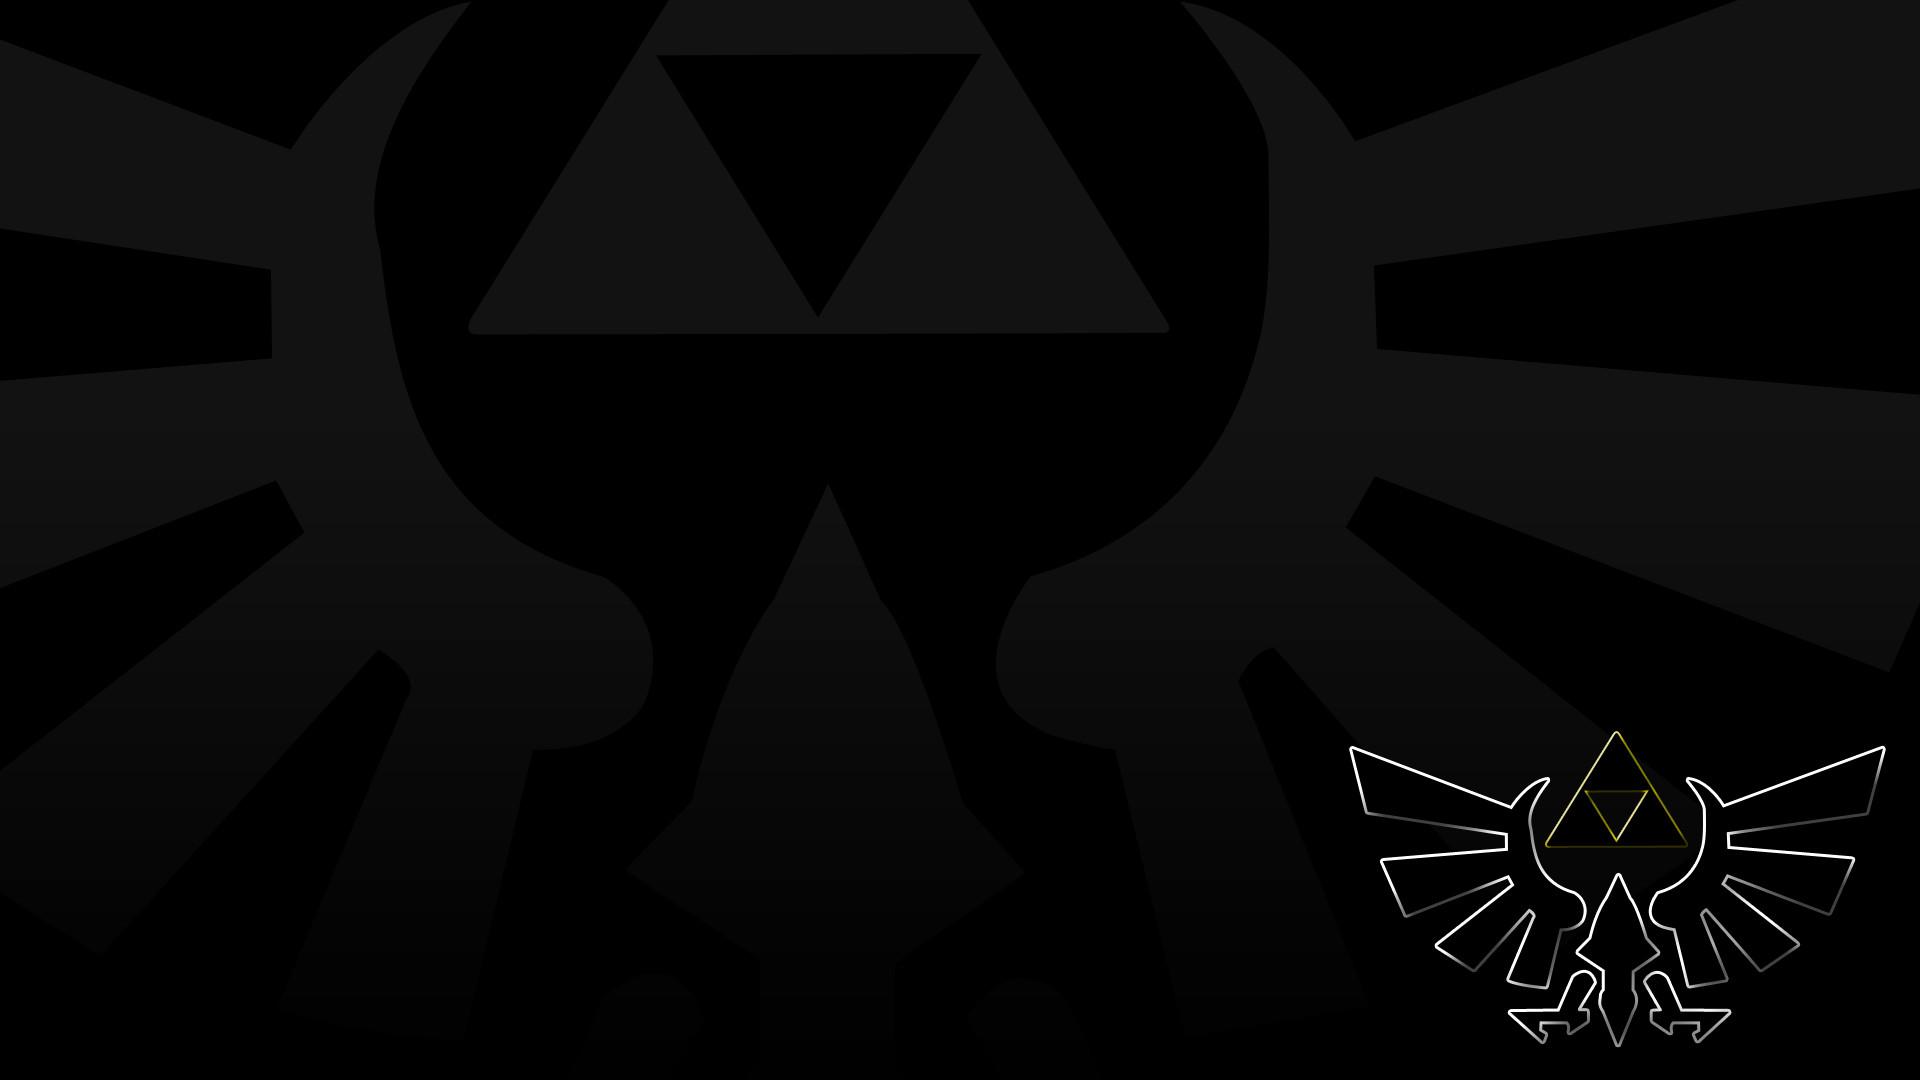 Triforce The Wallpaper Triforce, The, Legend, Of, Zelda